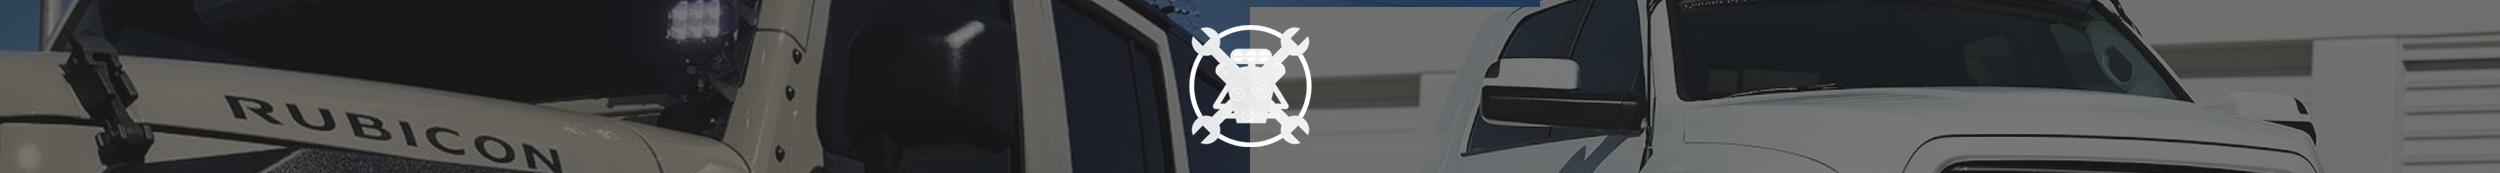 Jeep and Dodge Ram